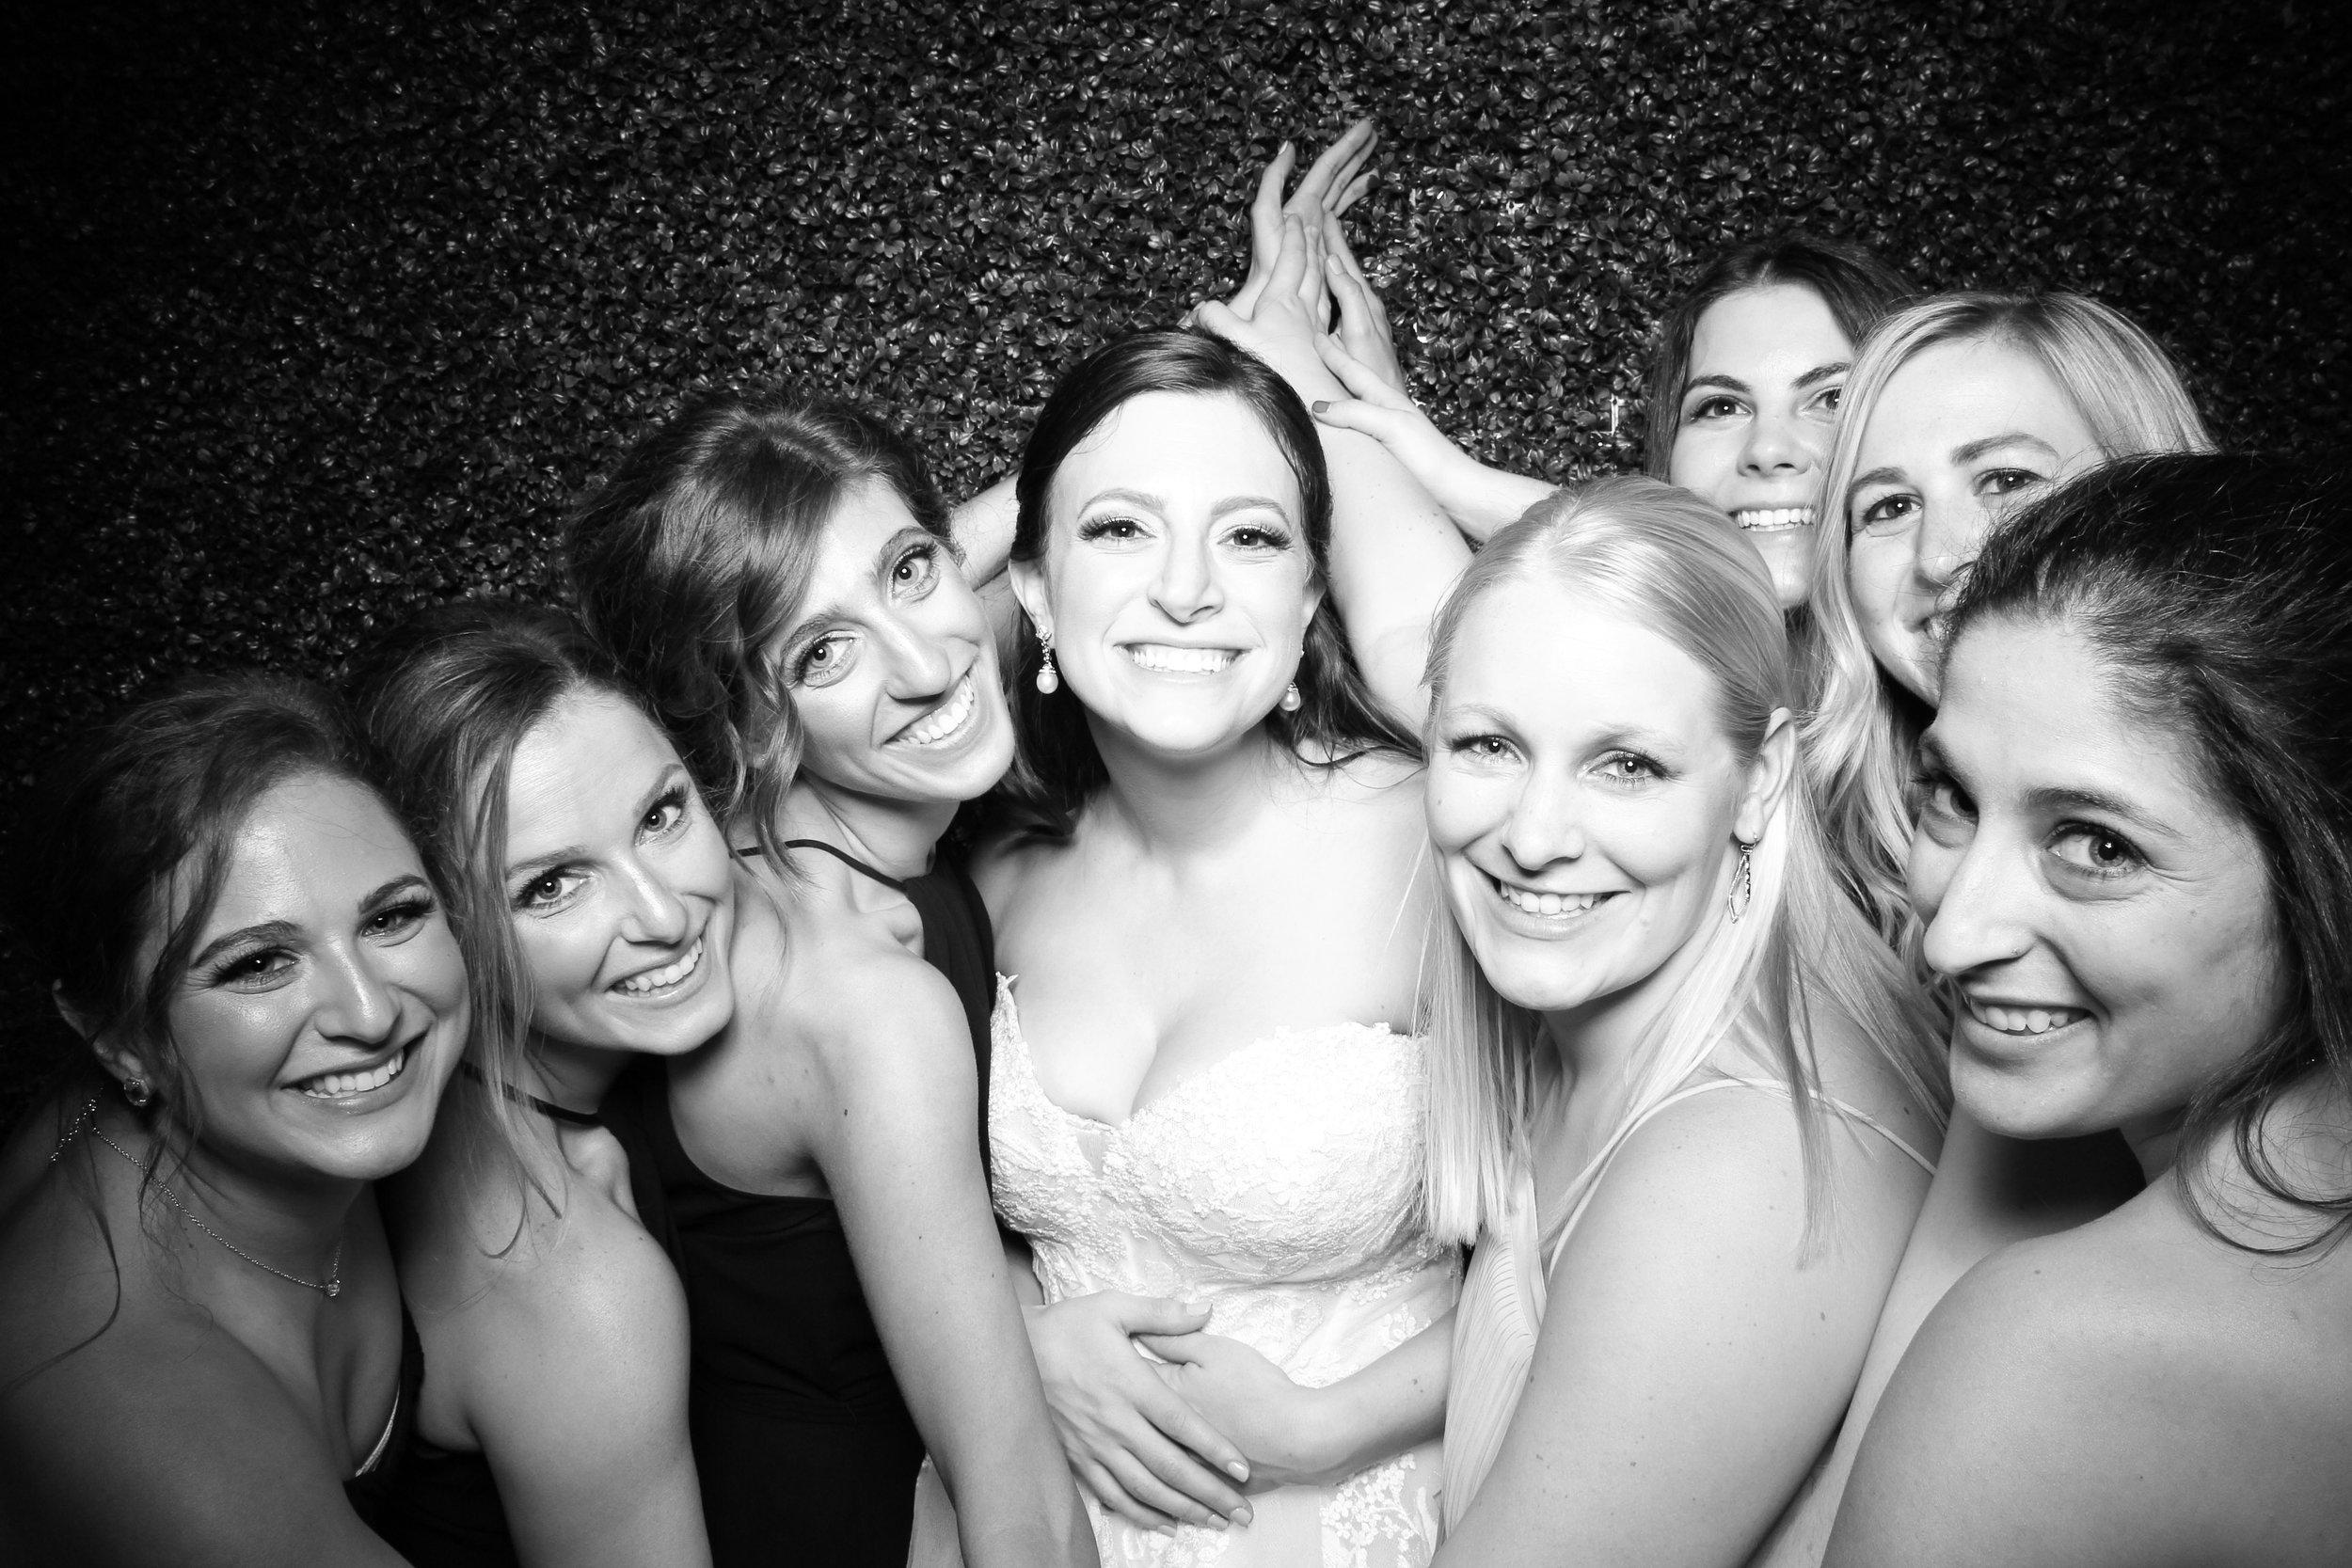 Ivy_Room_Chicago_Wedding_Reception_Photo_Booth_Rental__16.jpg